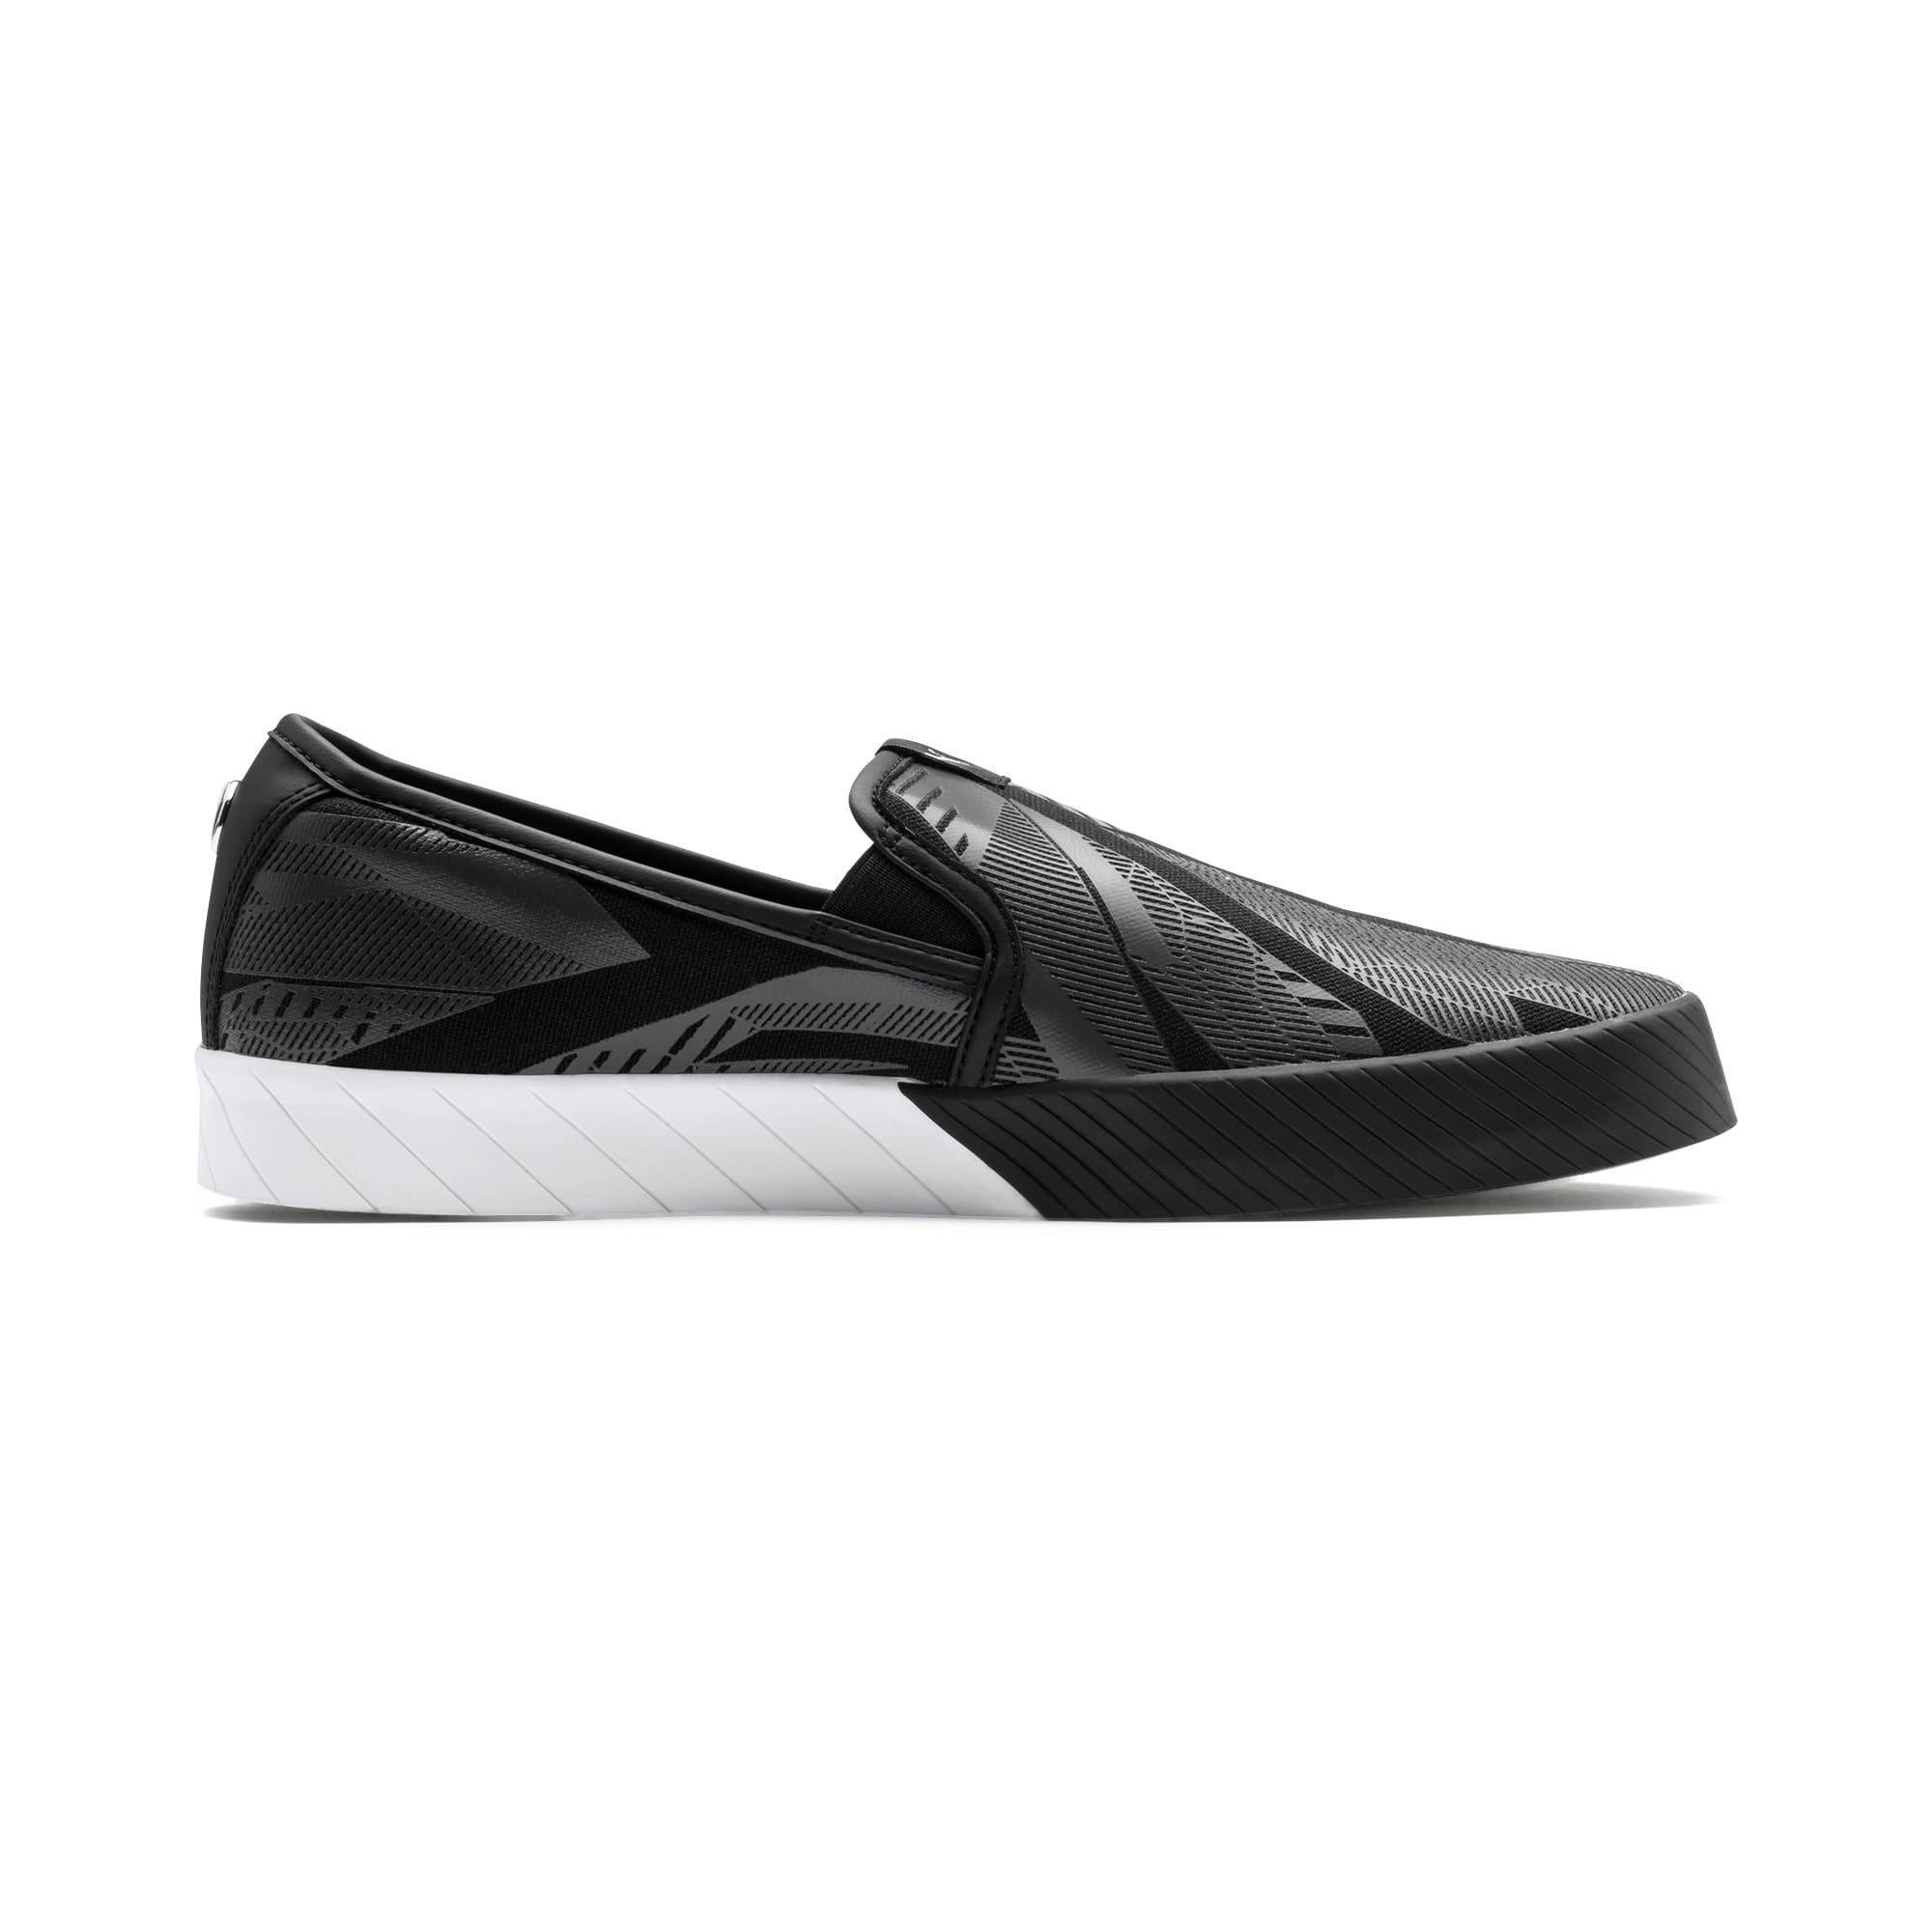 Thumbnail 7 of BMW M Slip-On Track Shoes, Puma Black-Puma Black, medium-IND